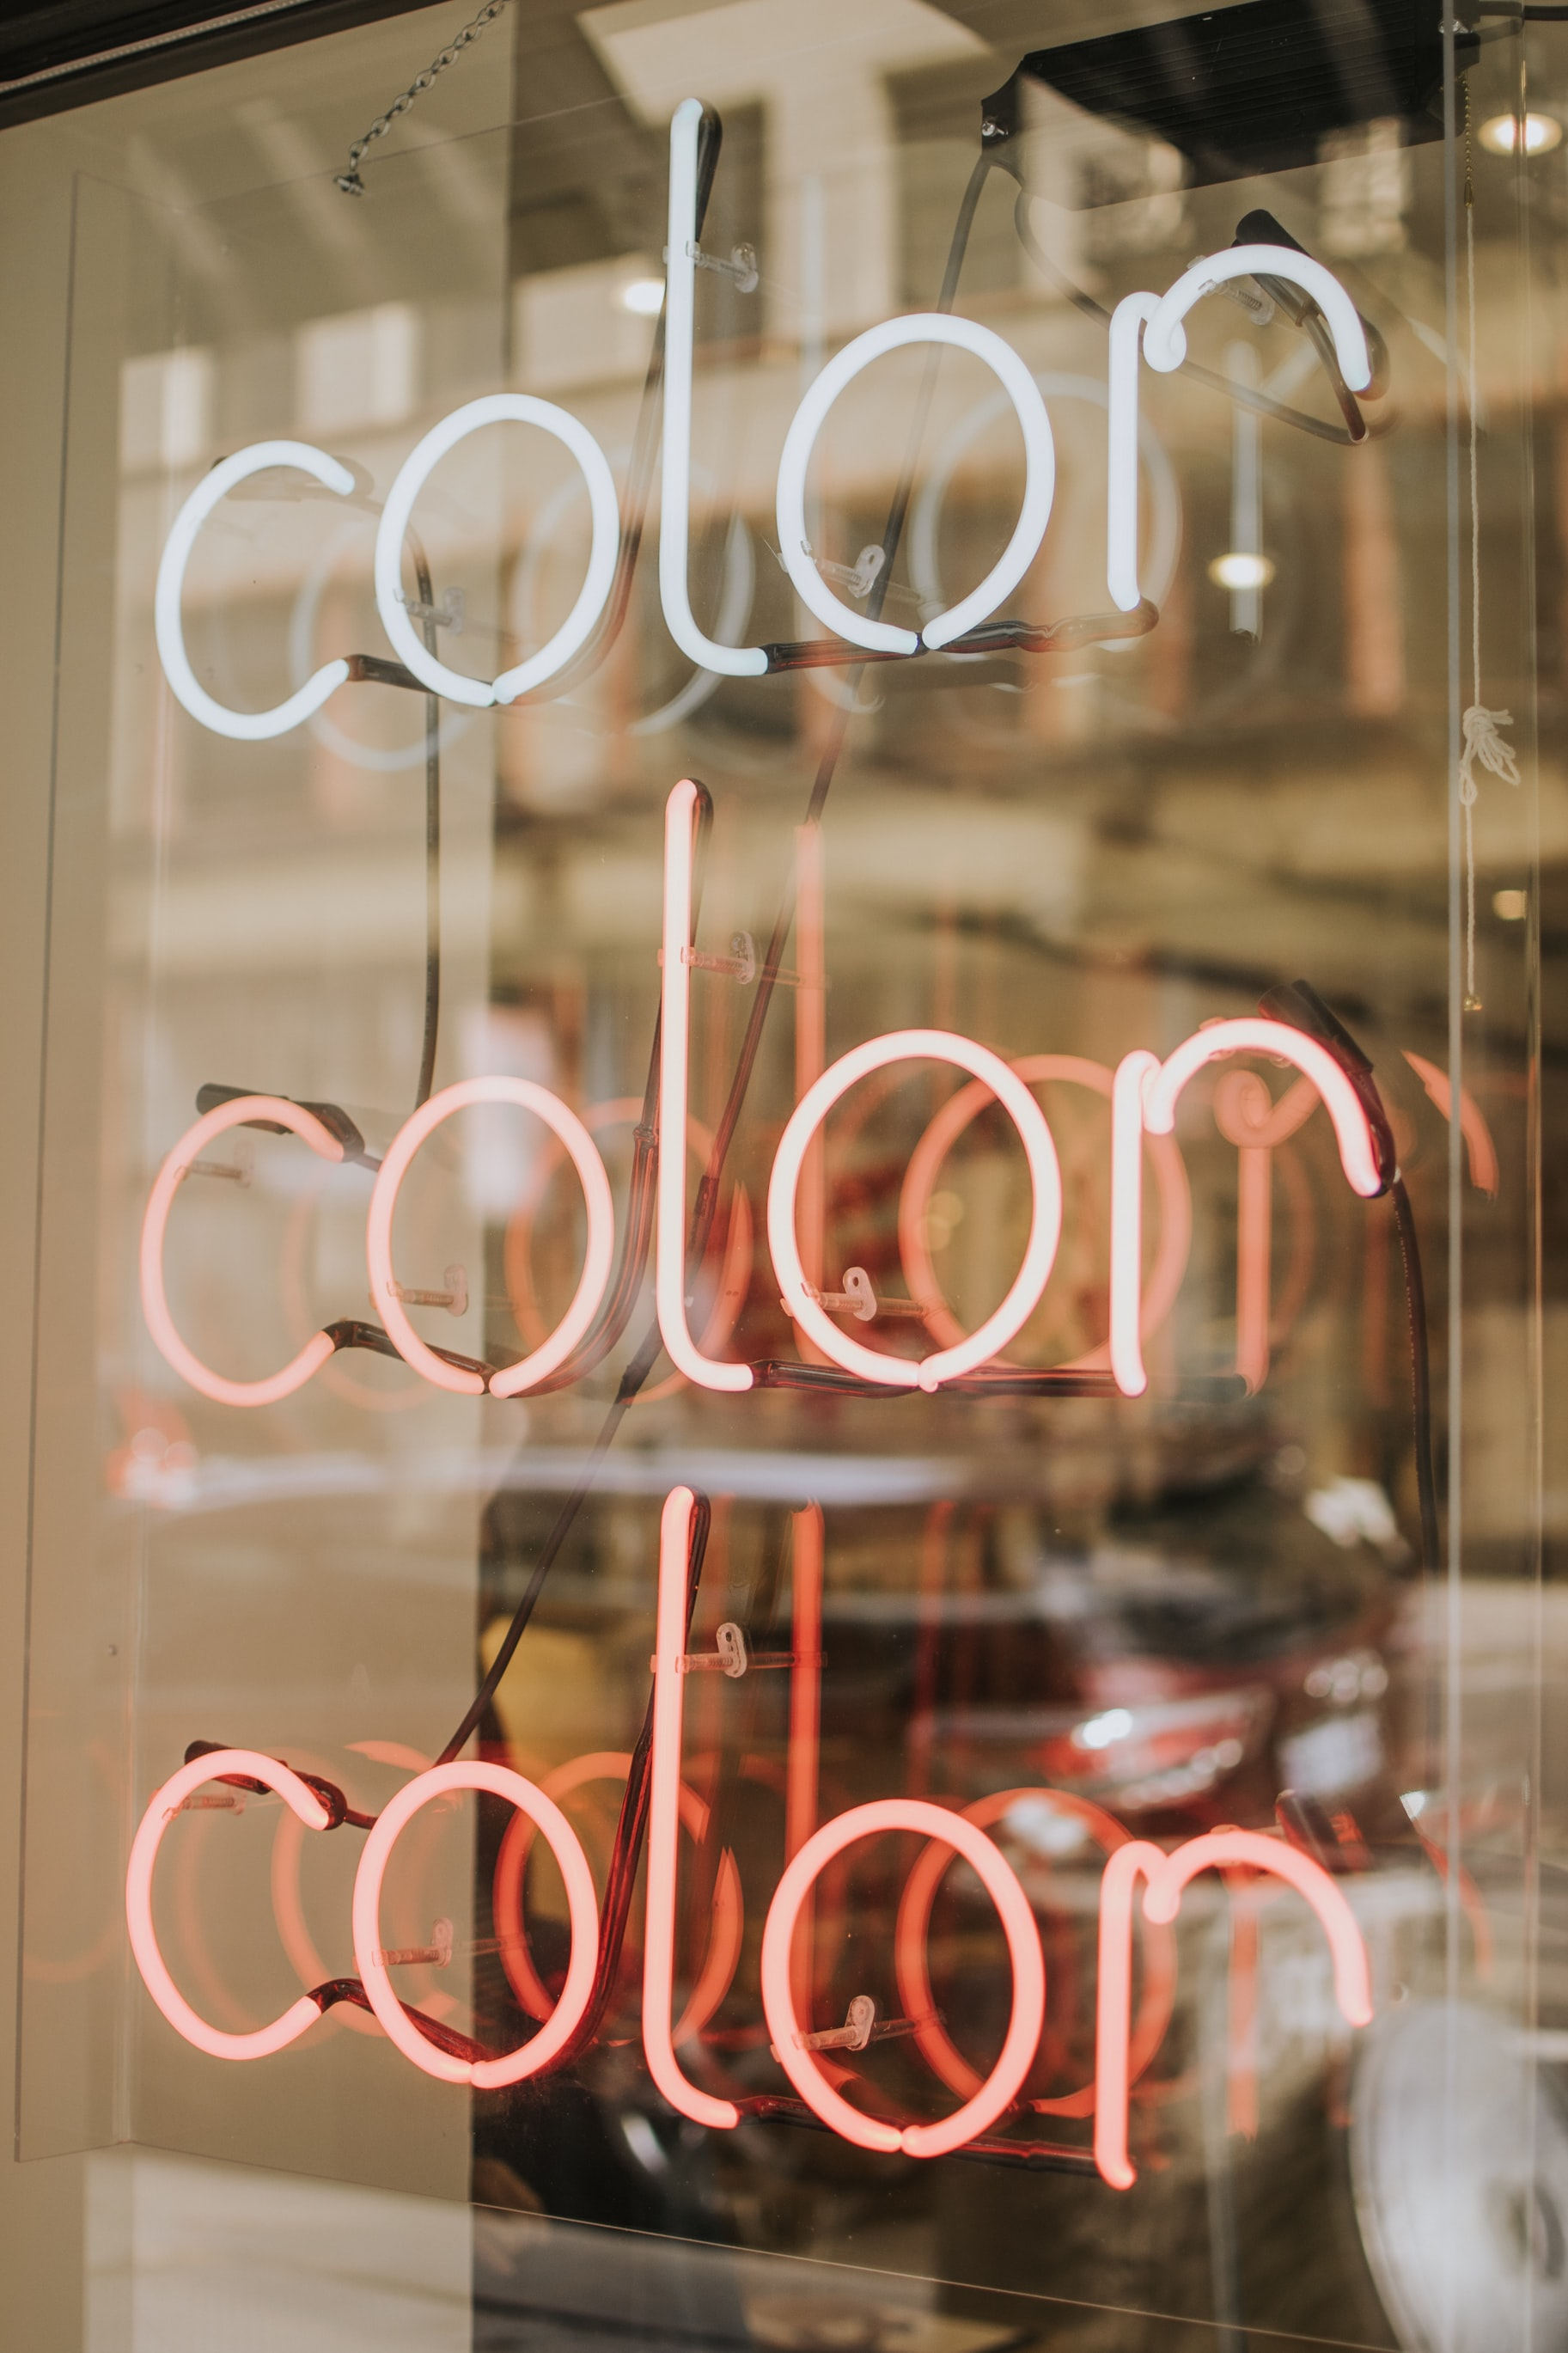 white Color LED light signage